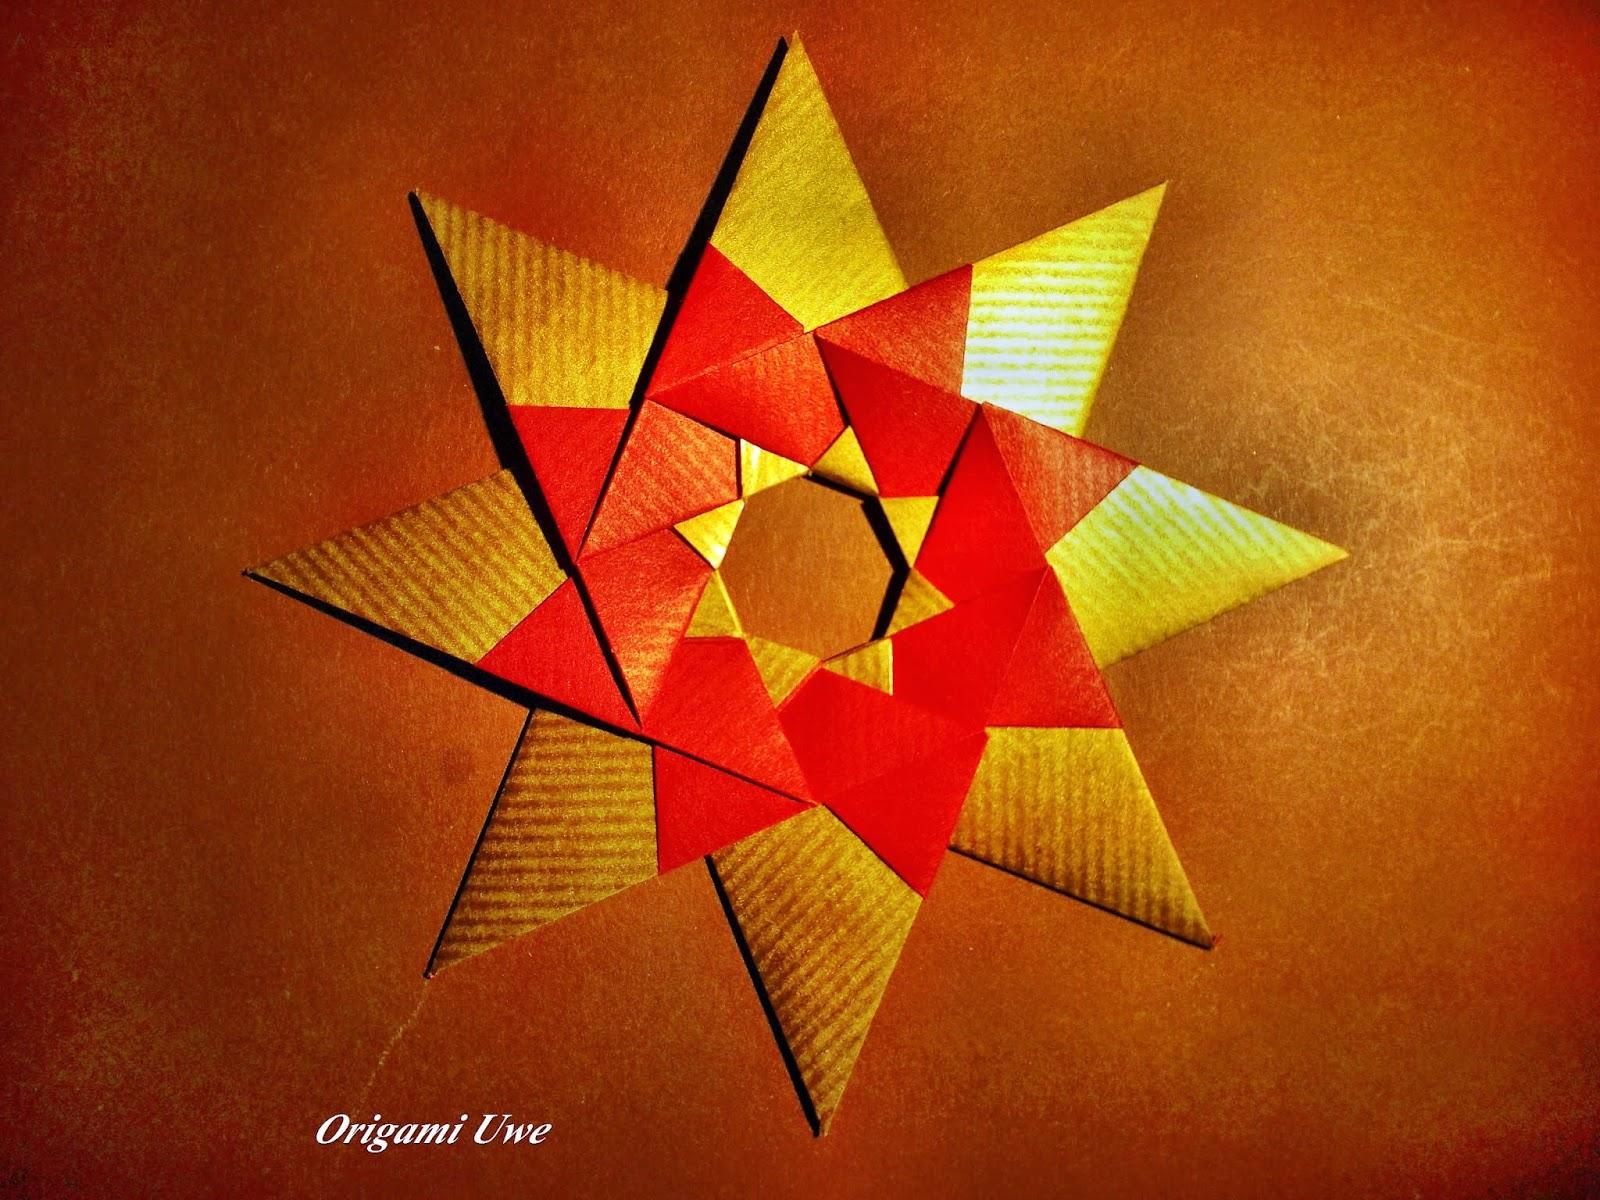 Origami, Fleurogami und Sterne: Modular Origami Star - photo#33